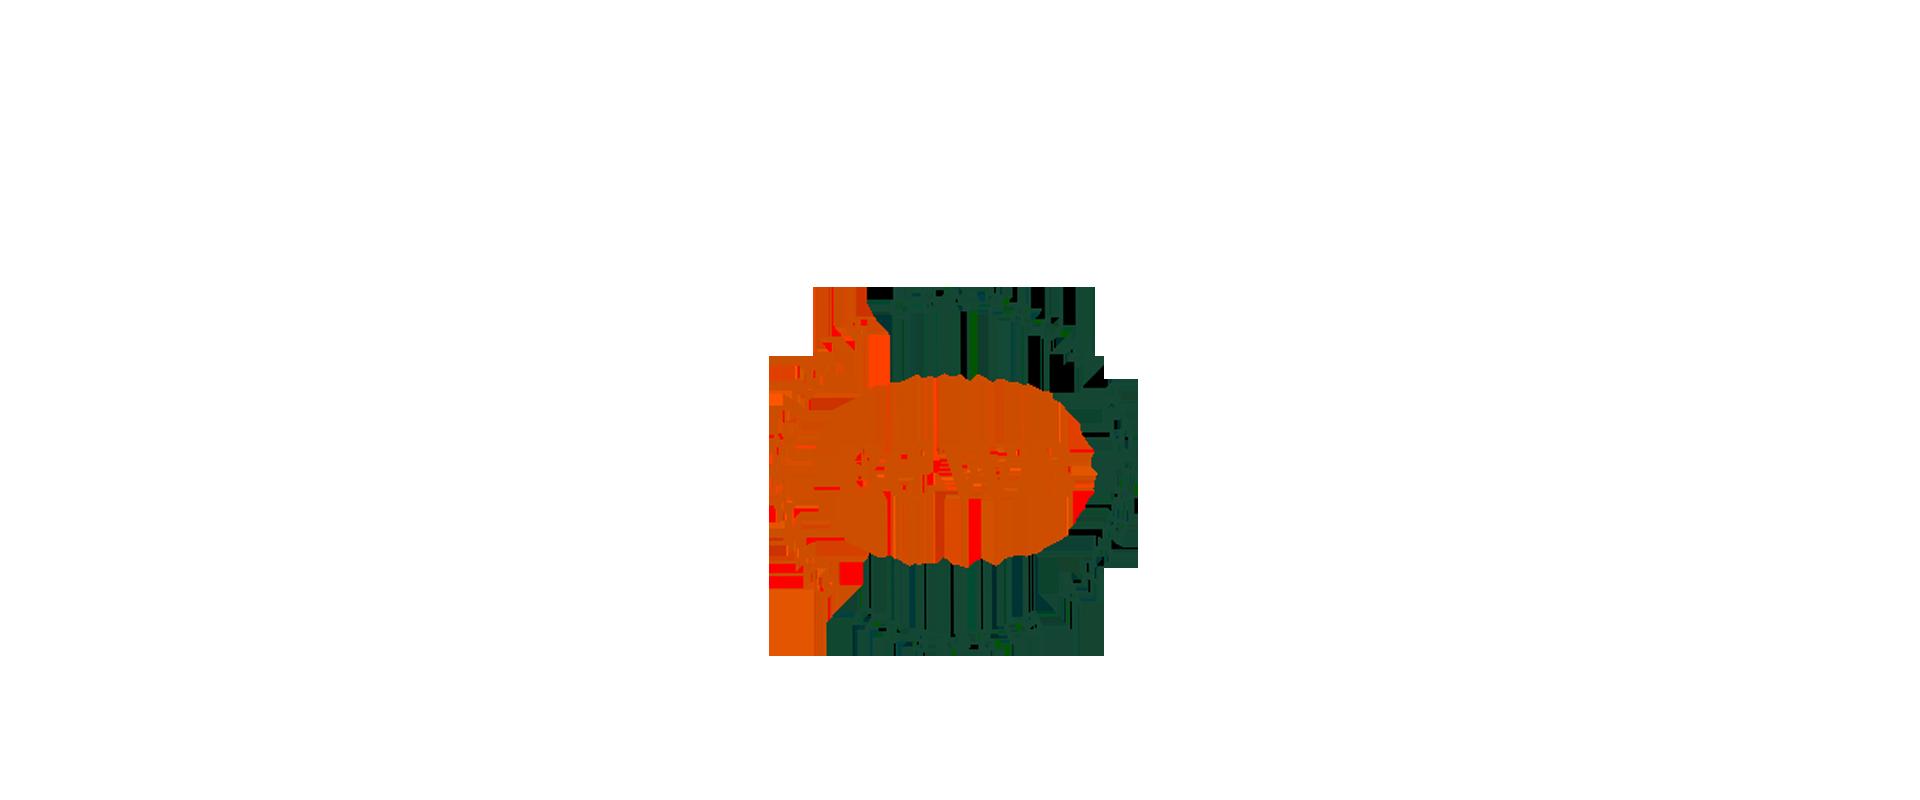 https://ecwb.pl/wp-content/uploads/2021/06/tlo-glowne-8-ecwb.png